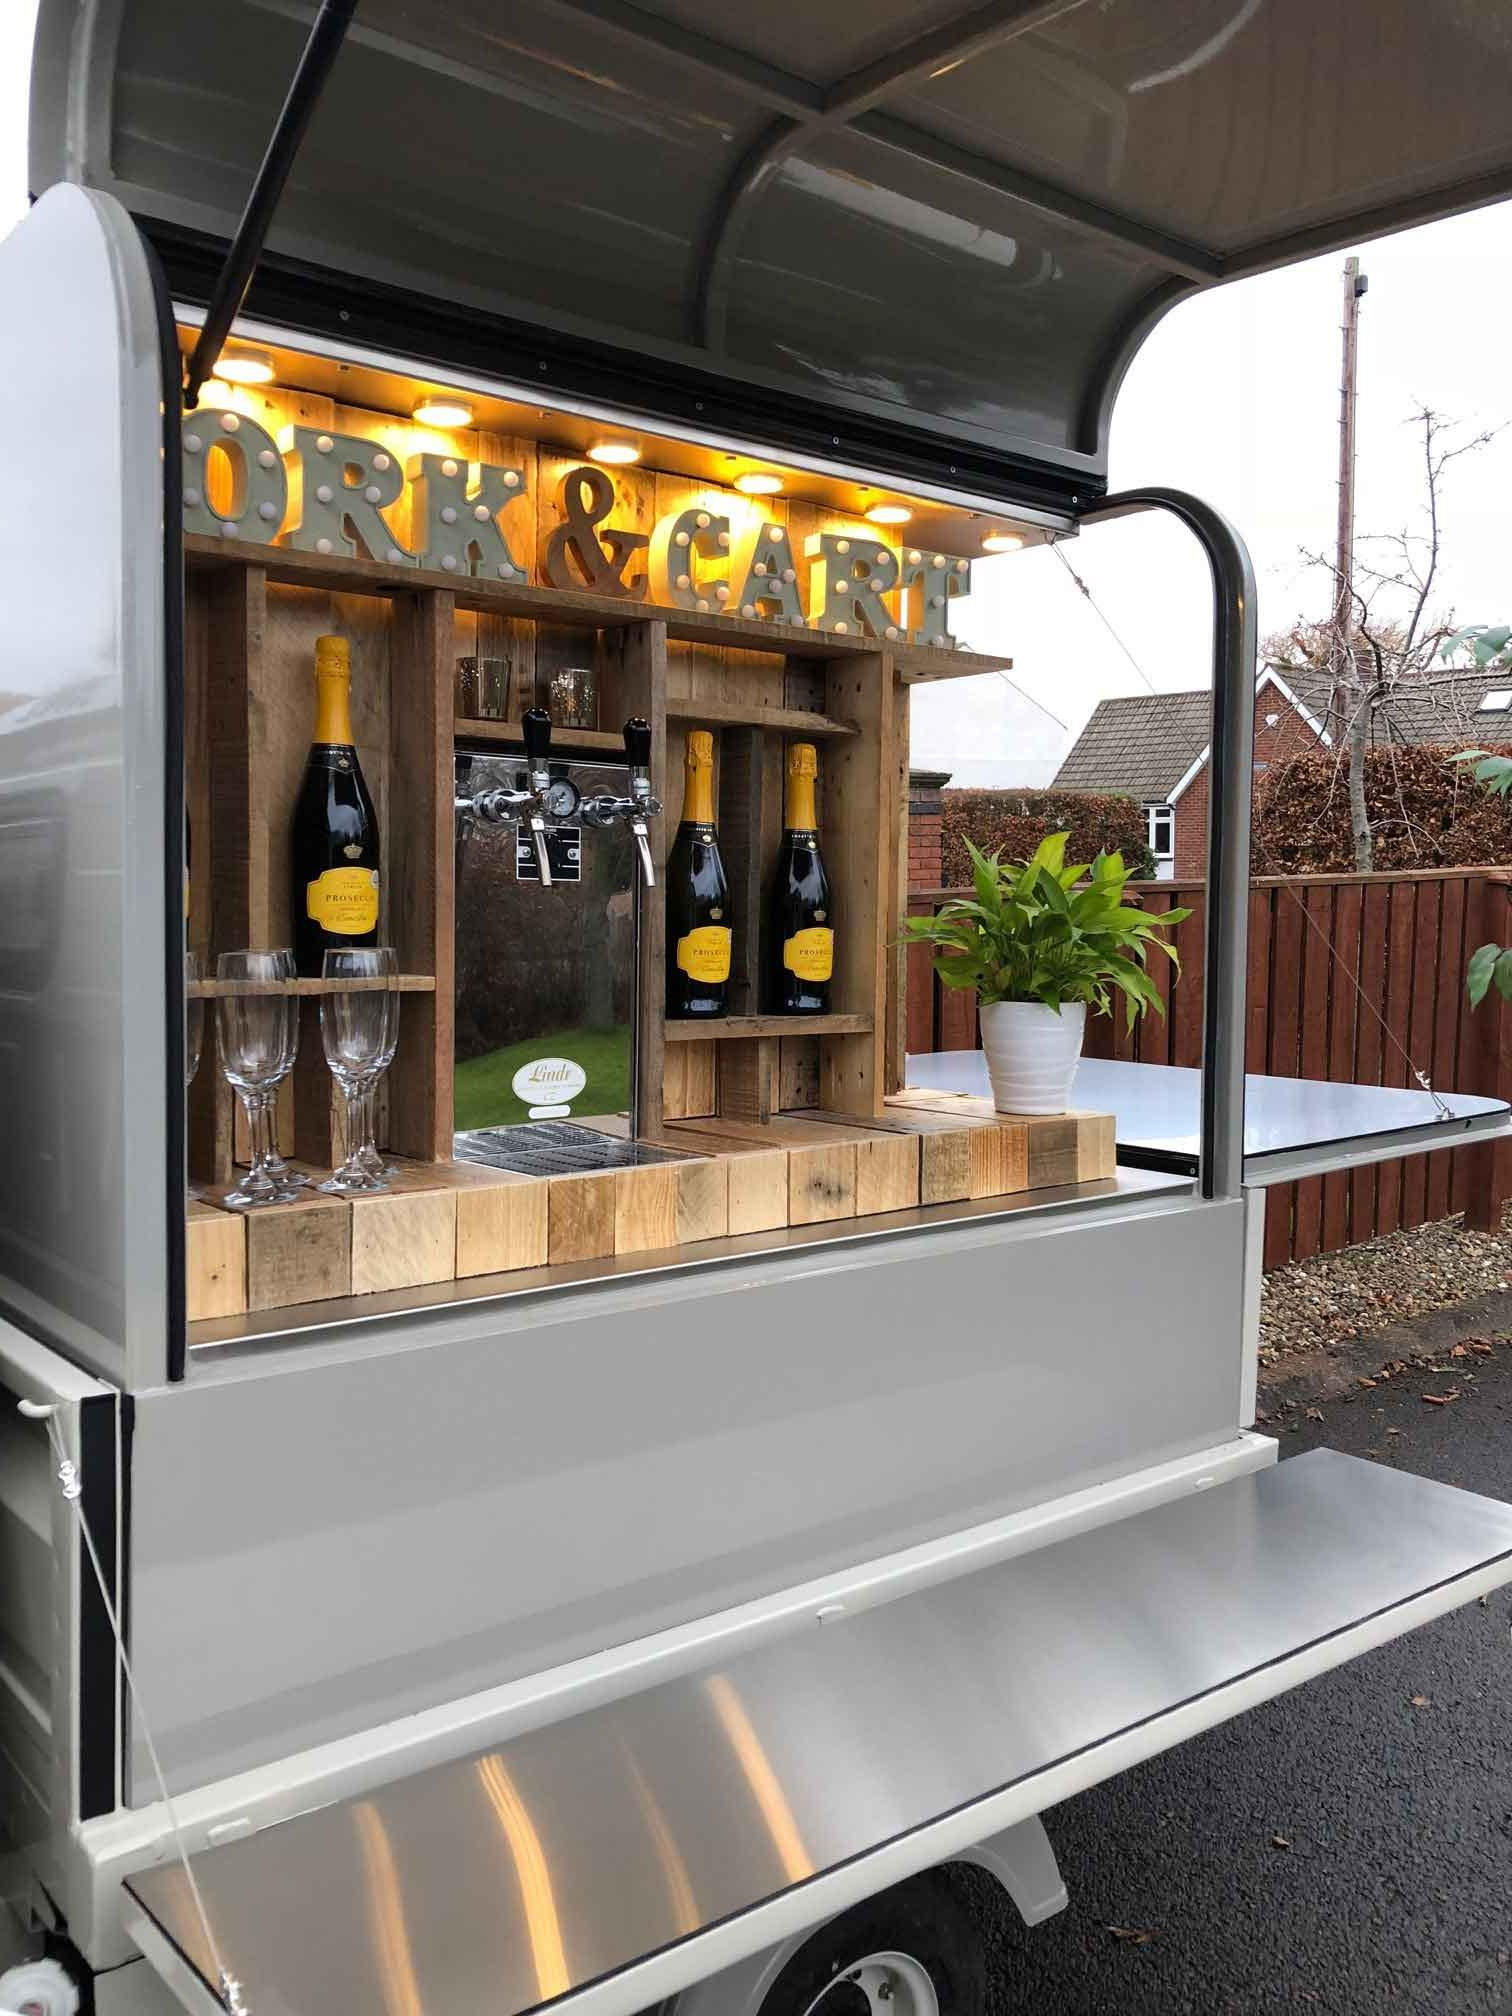 Cork & Cart Mobile Bar Trailer